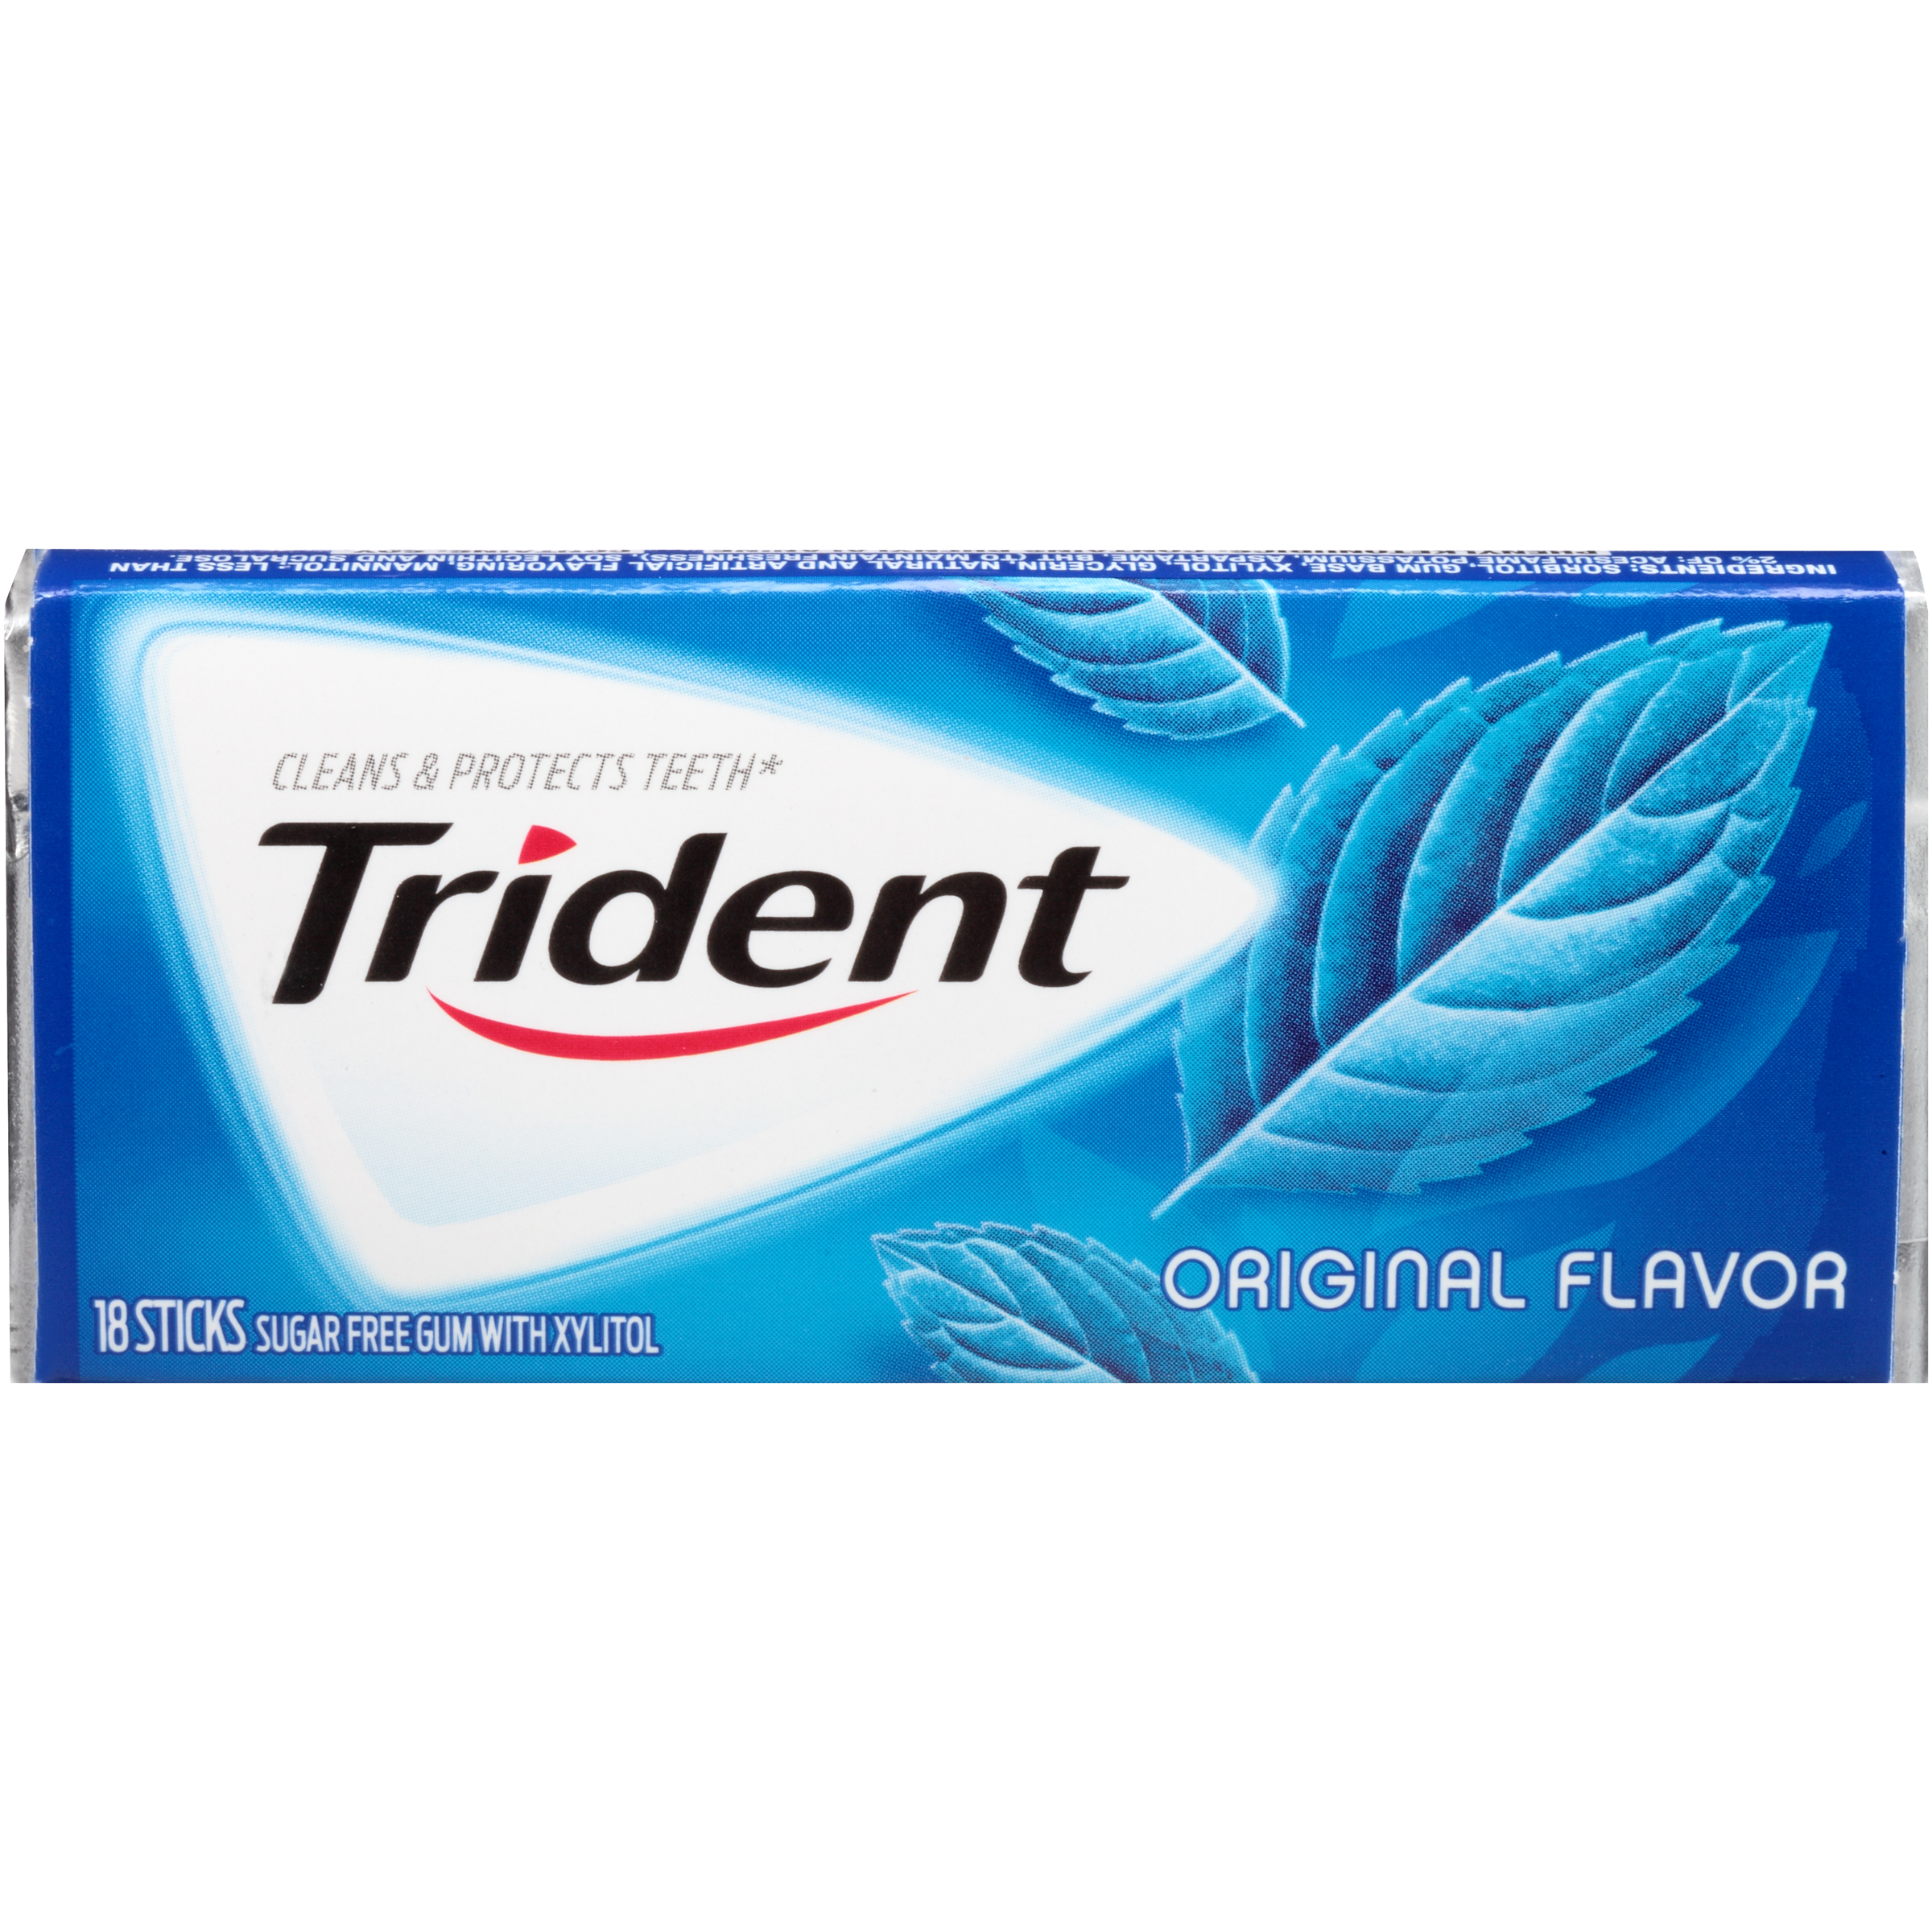 Trident Sugarless Chewing Gum Val-U-Pak Original - 12 X 18 Stick Pack